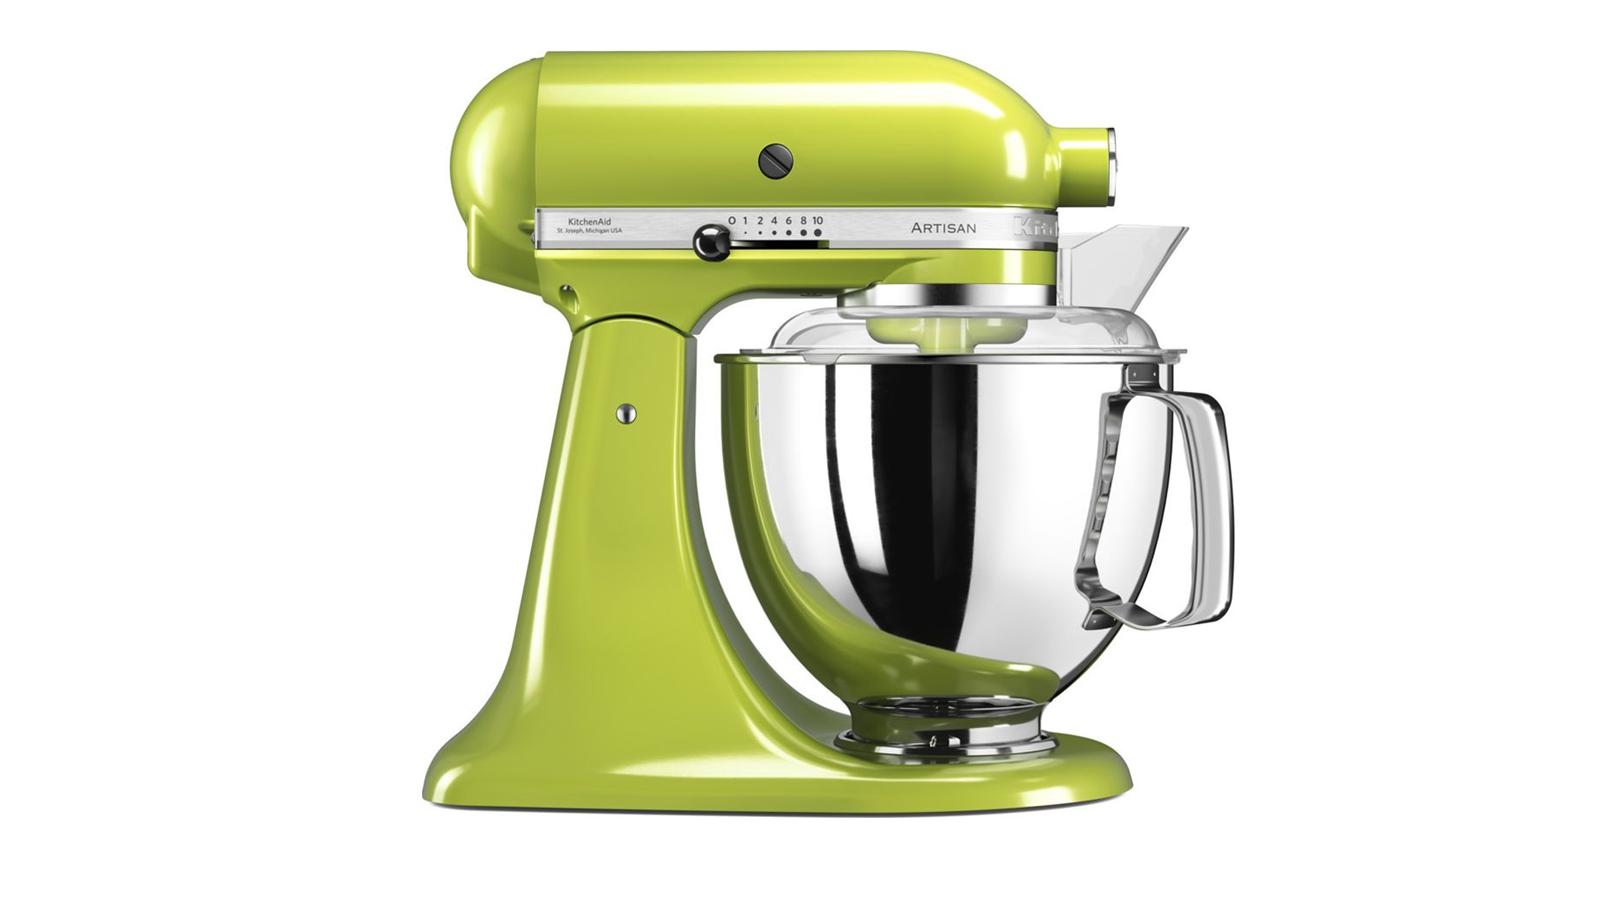 KitchenAid Artisan 5KSM 175PSBGA Stand Mixer   Green Apple